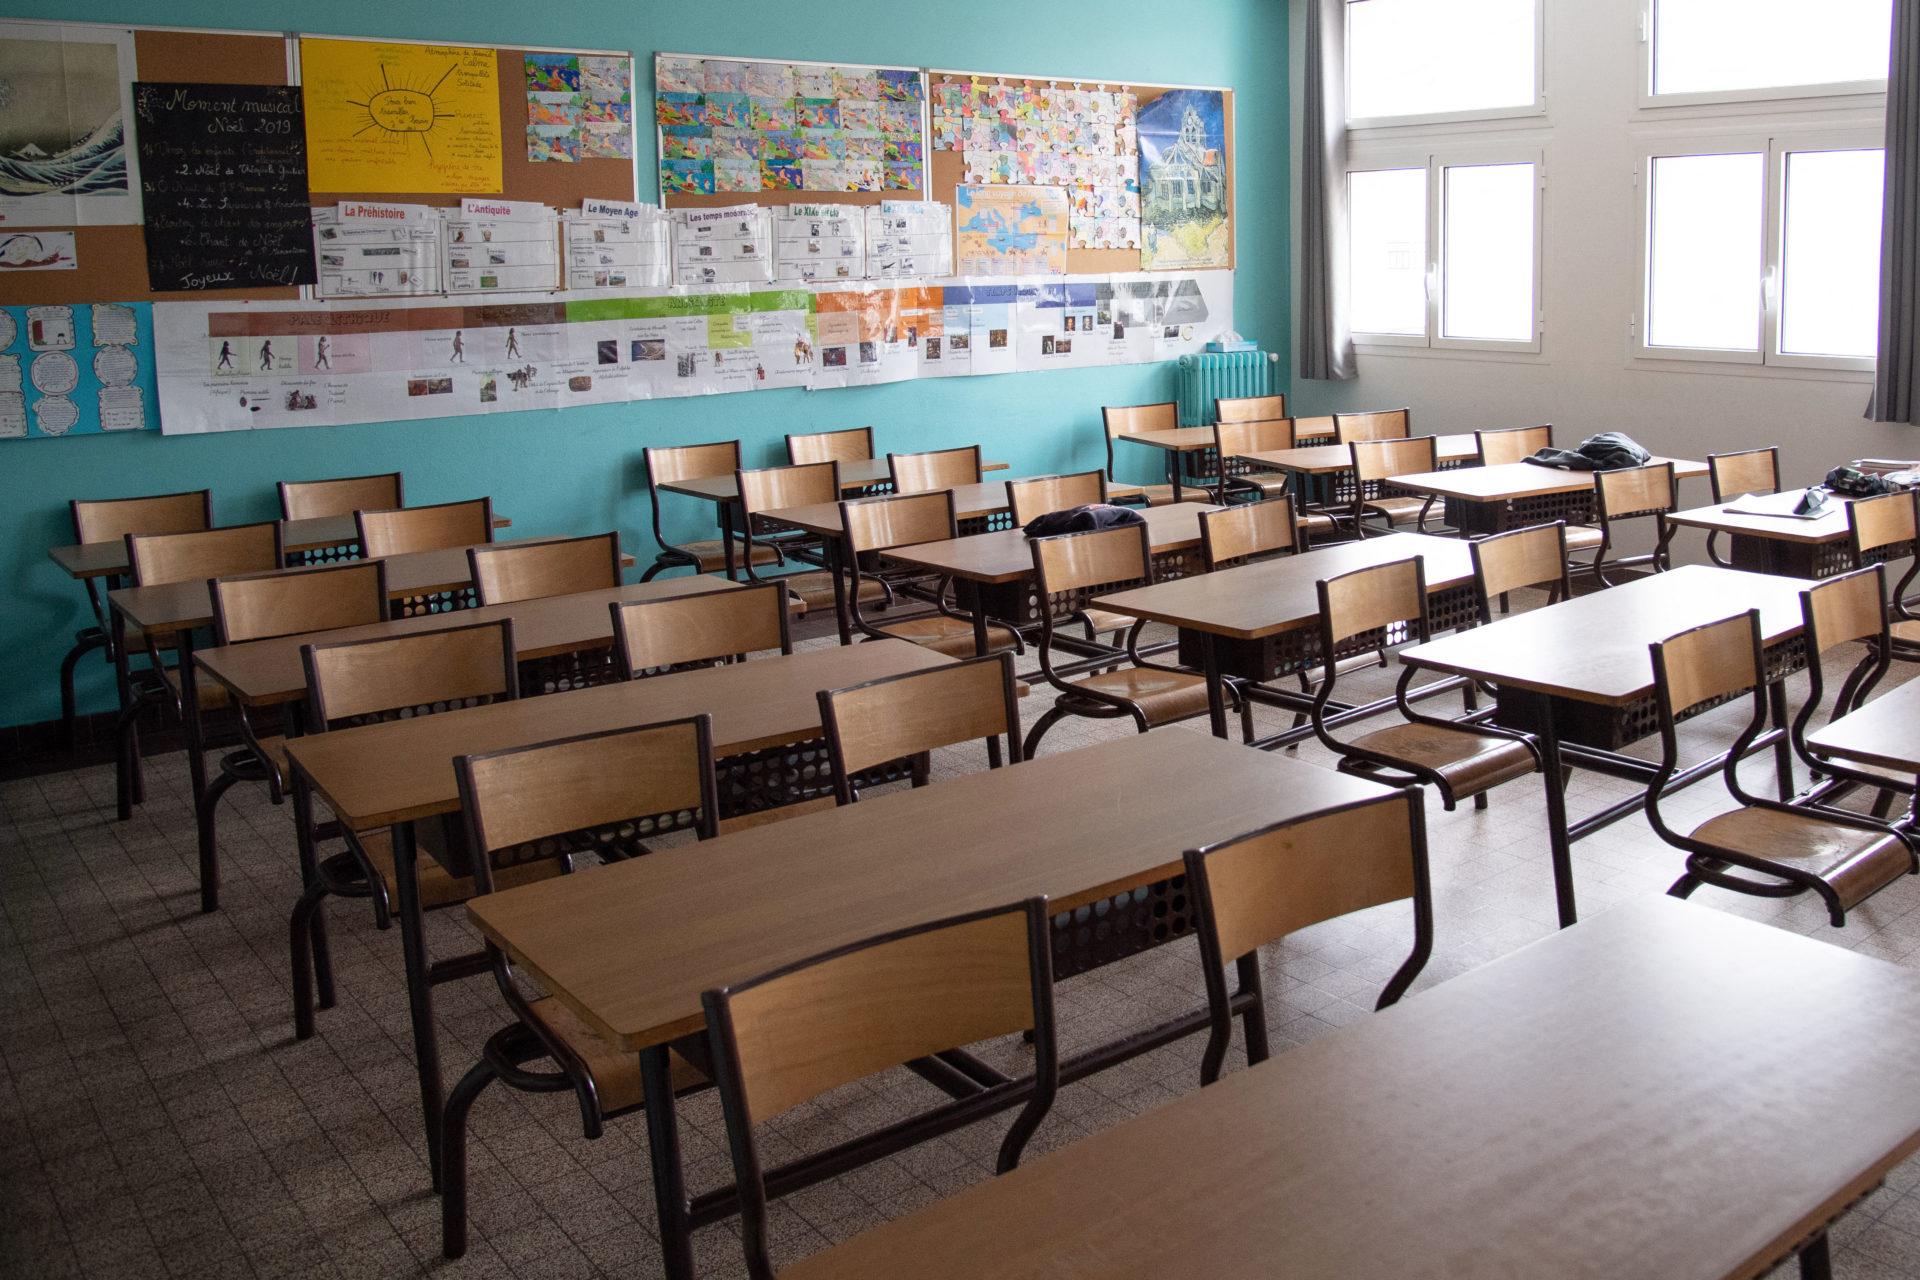 school.jpg?fit=1920%2C1280&ssl=1